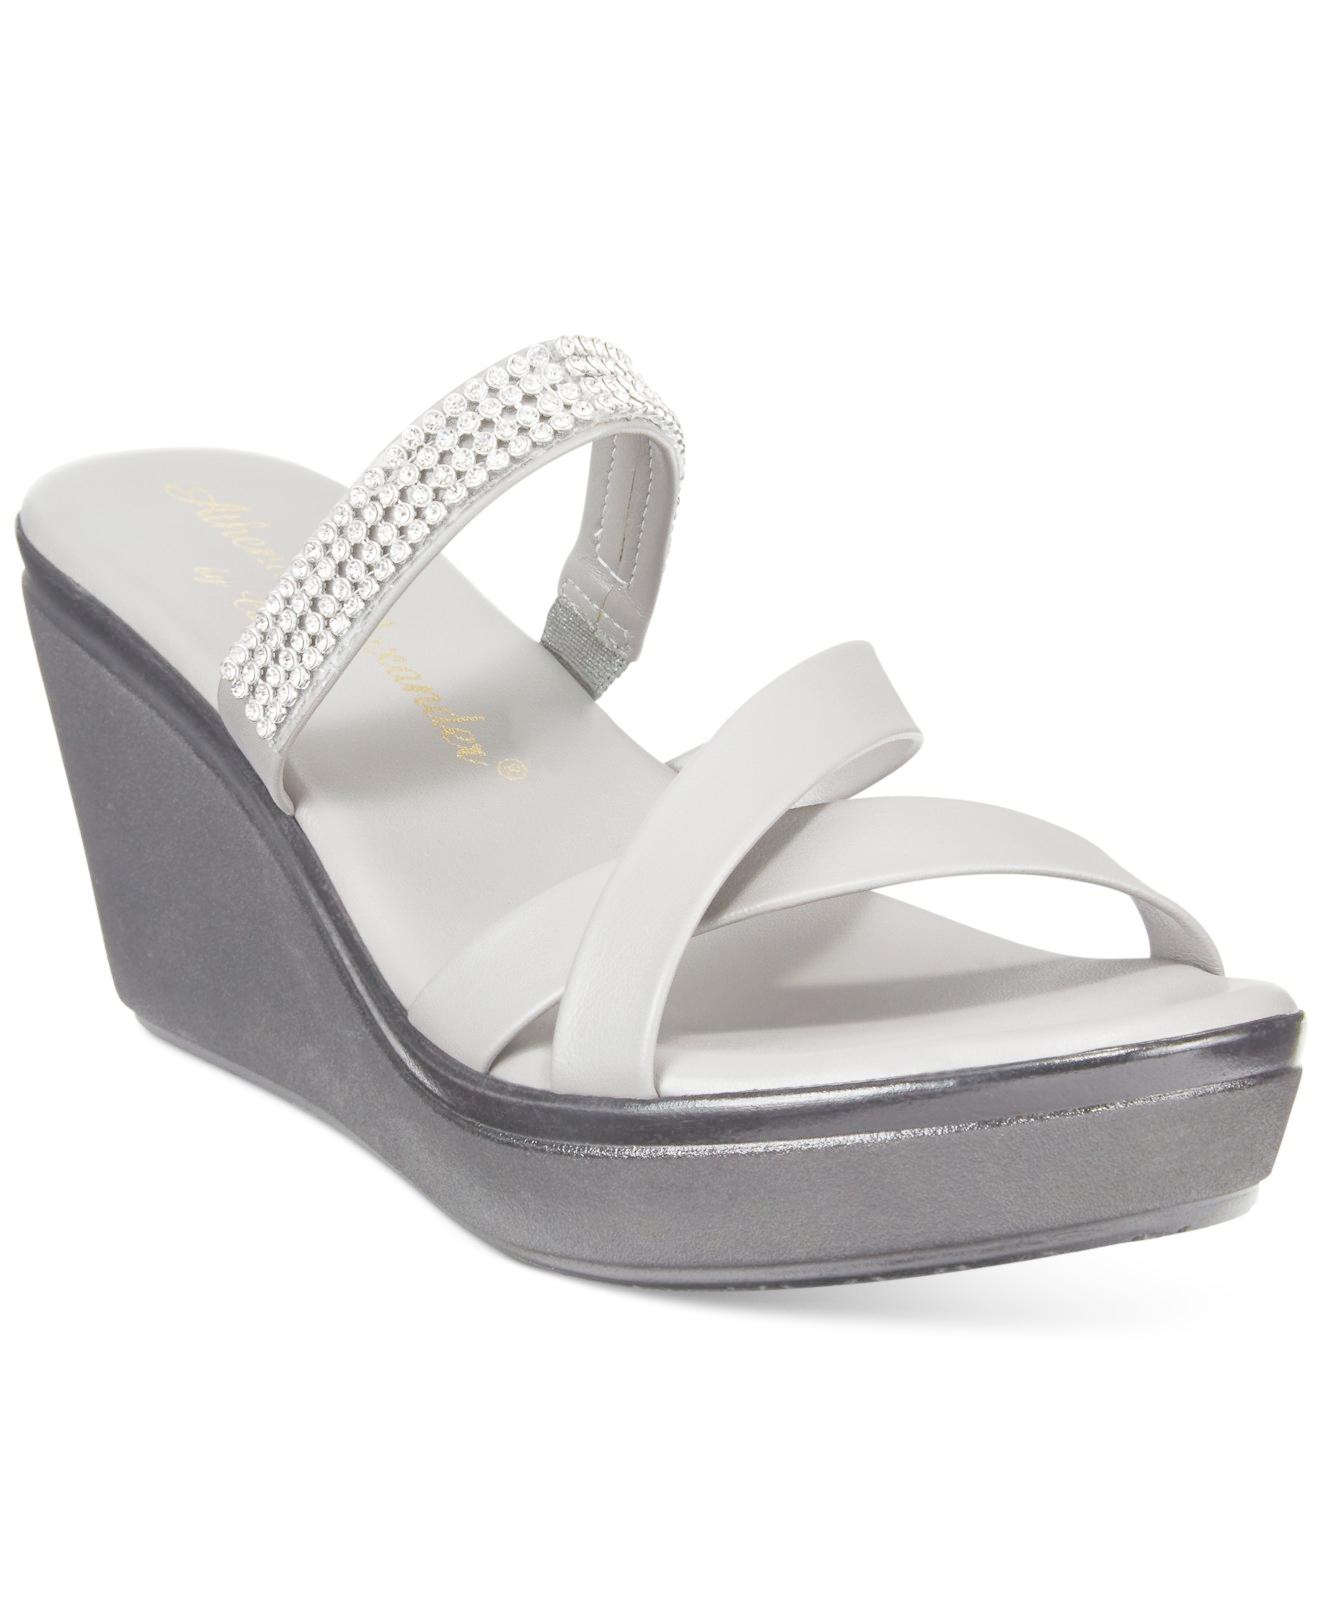 Callisto Athena Alexander By Modelle Wedge Sandals In